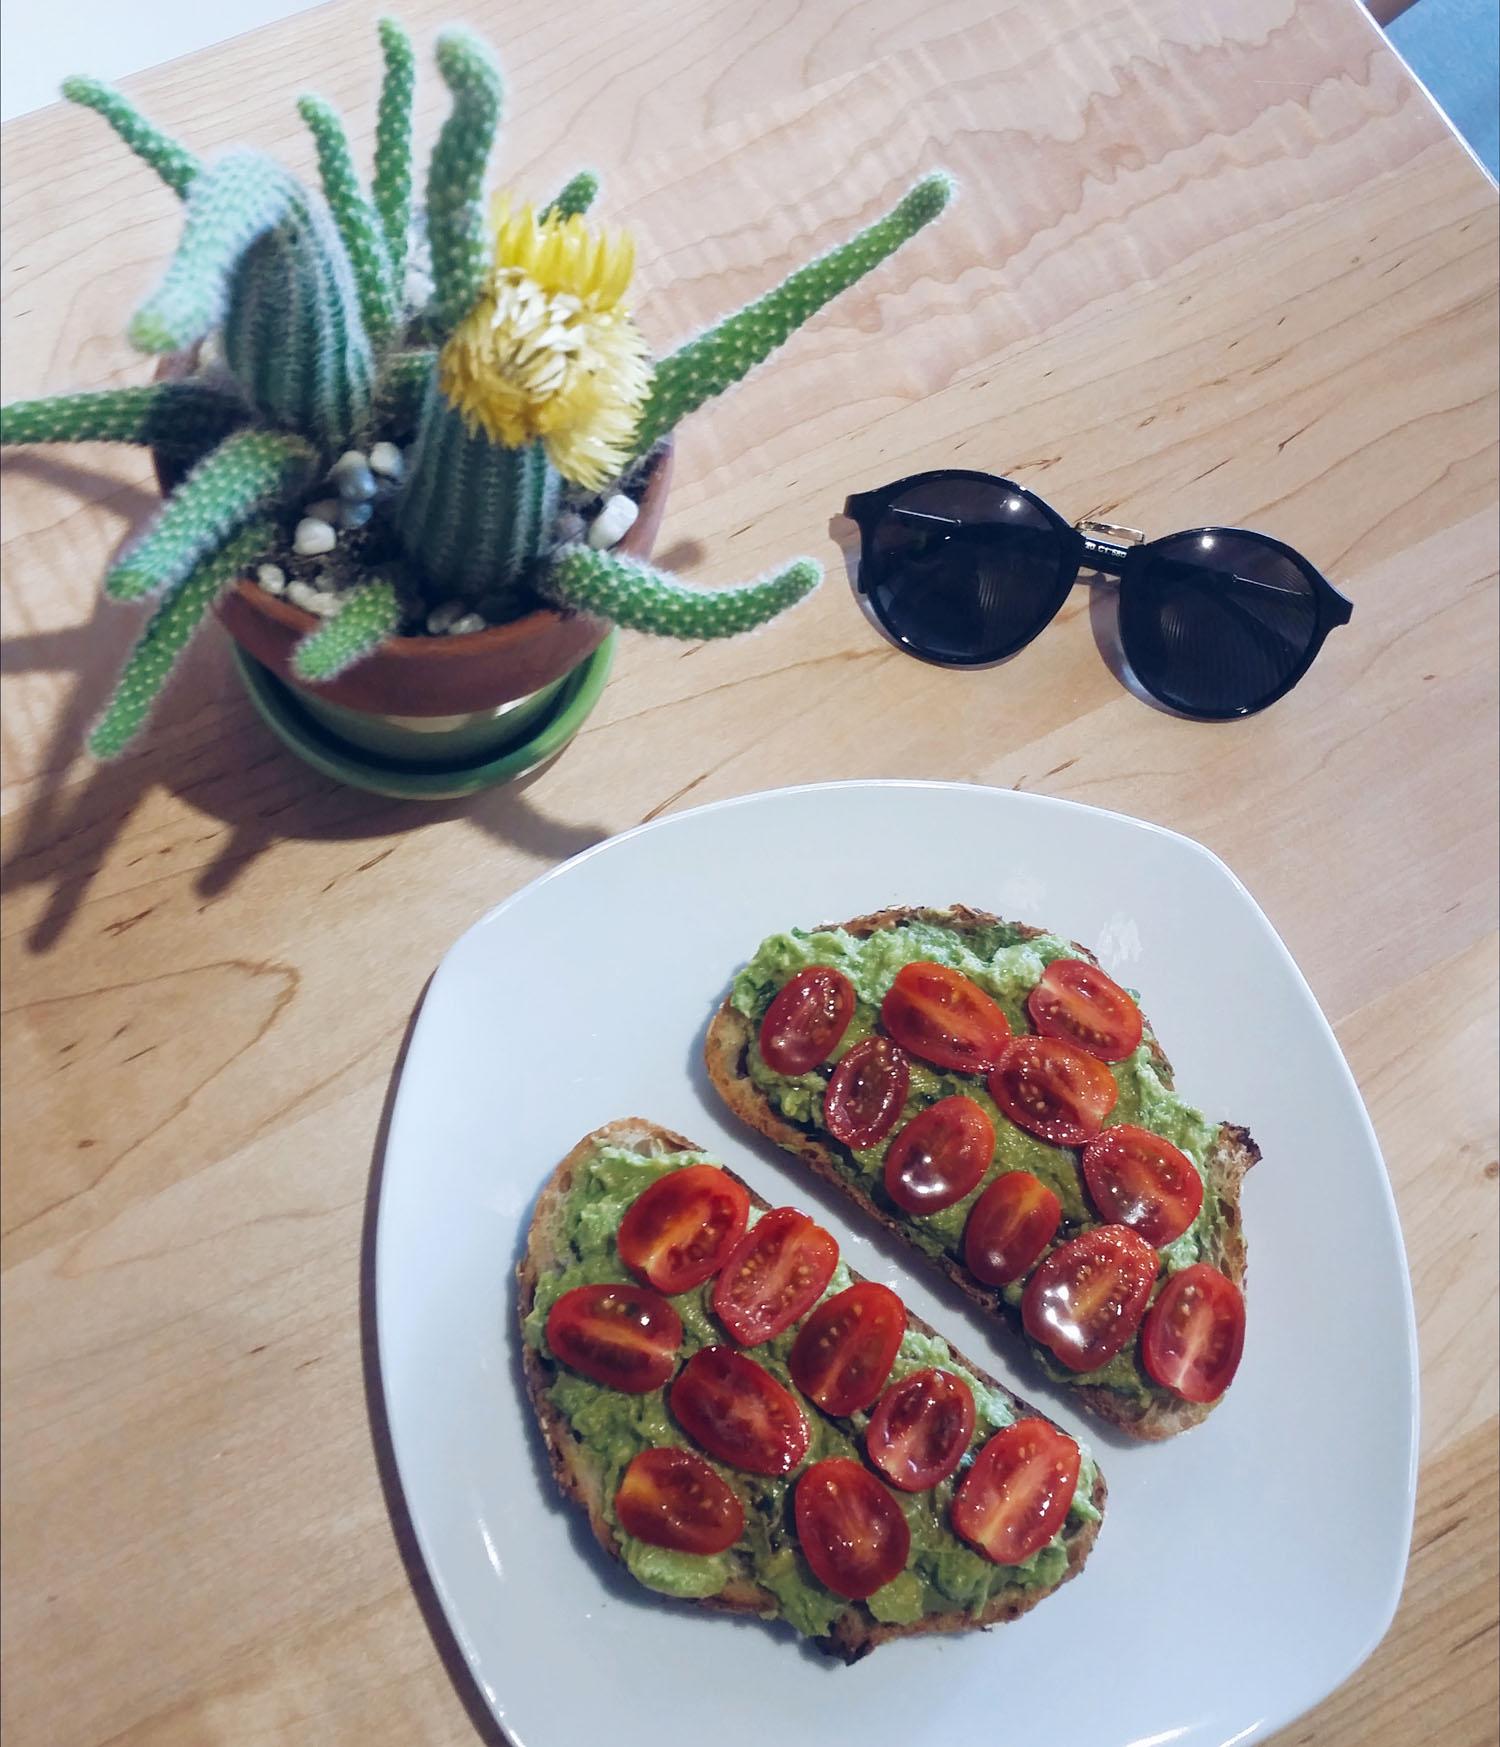 Avocado Toast Miami Vegan Spot Brickell